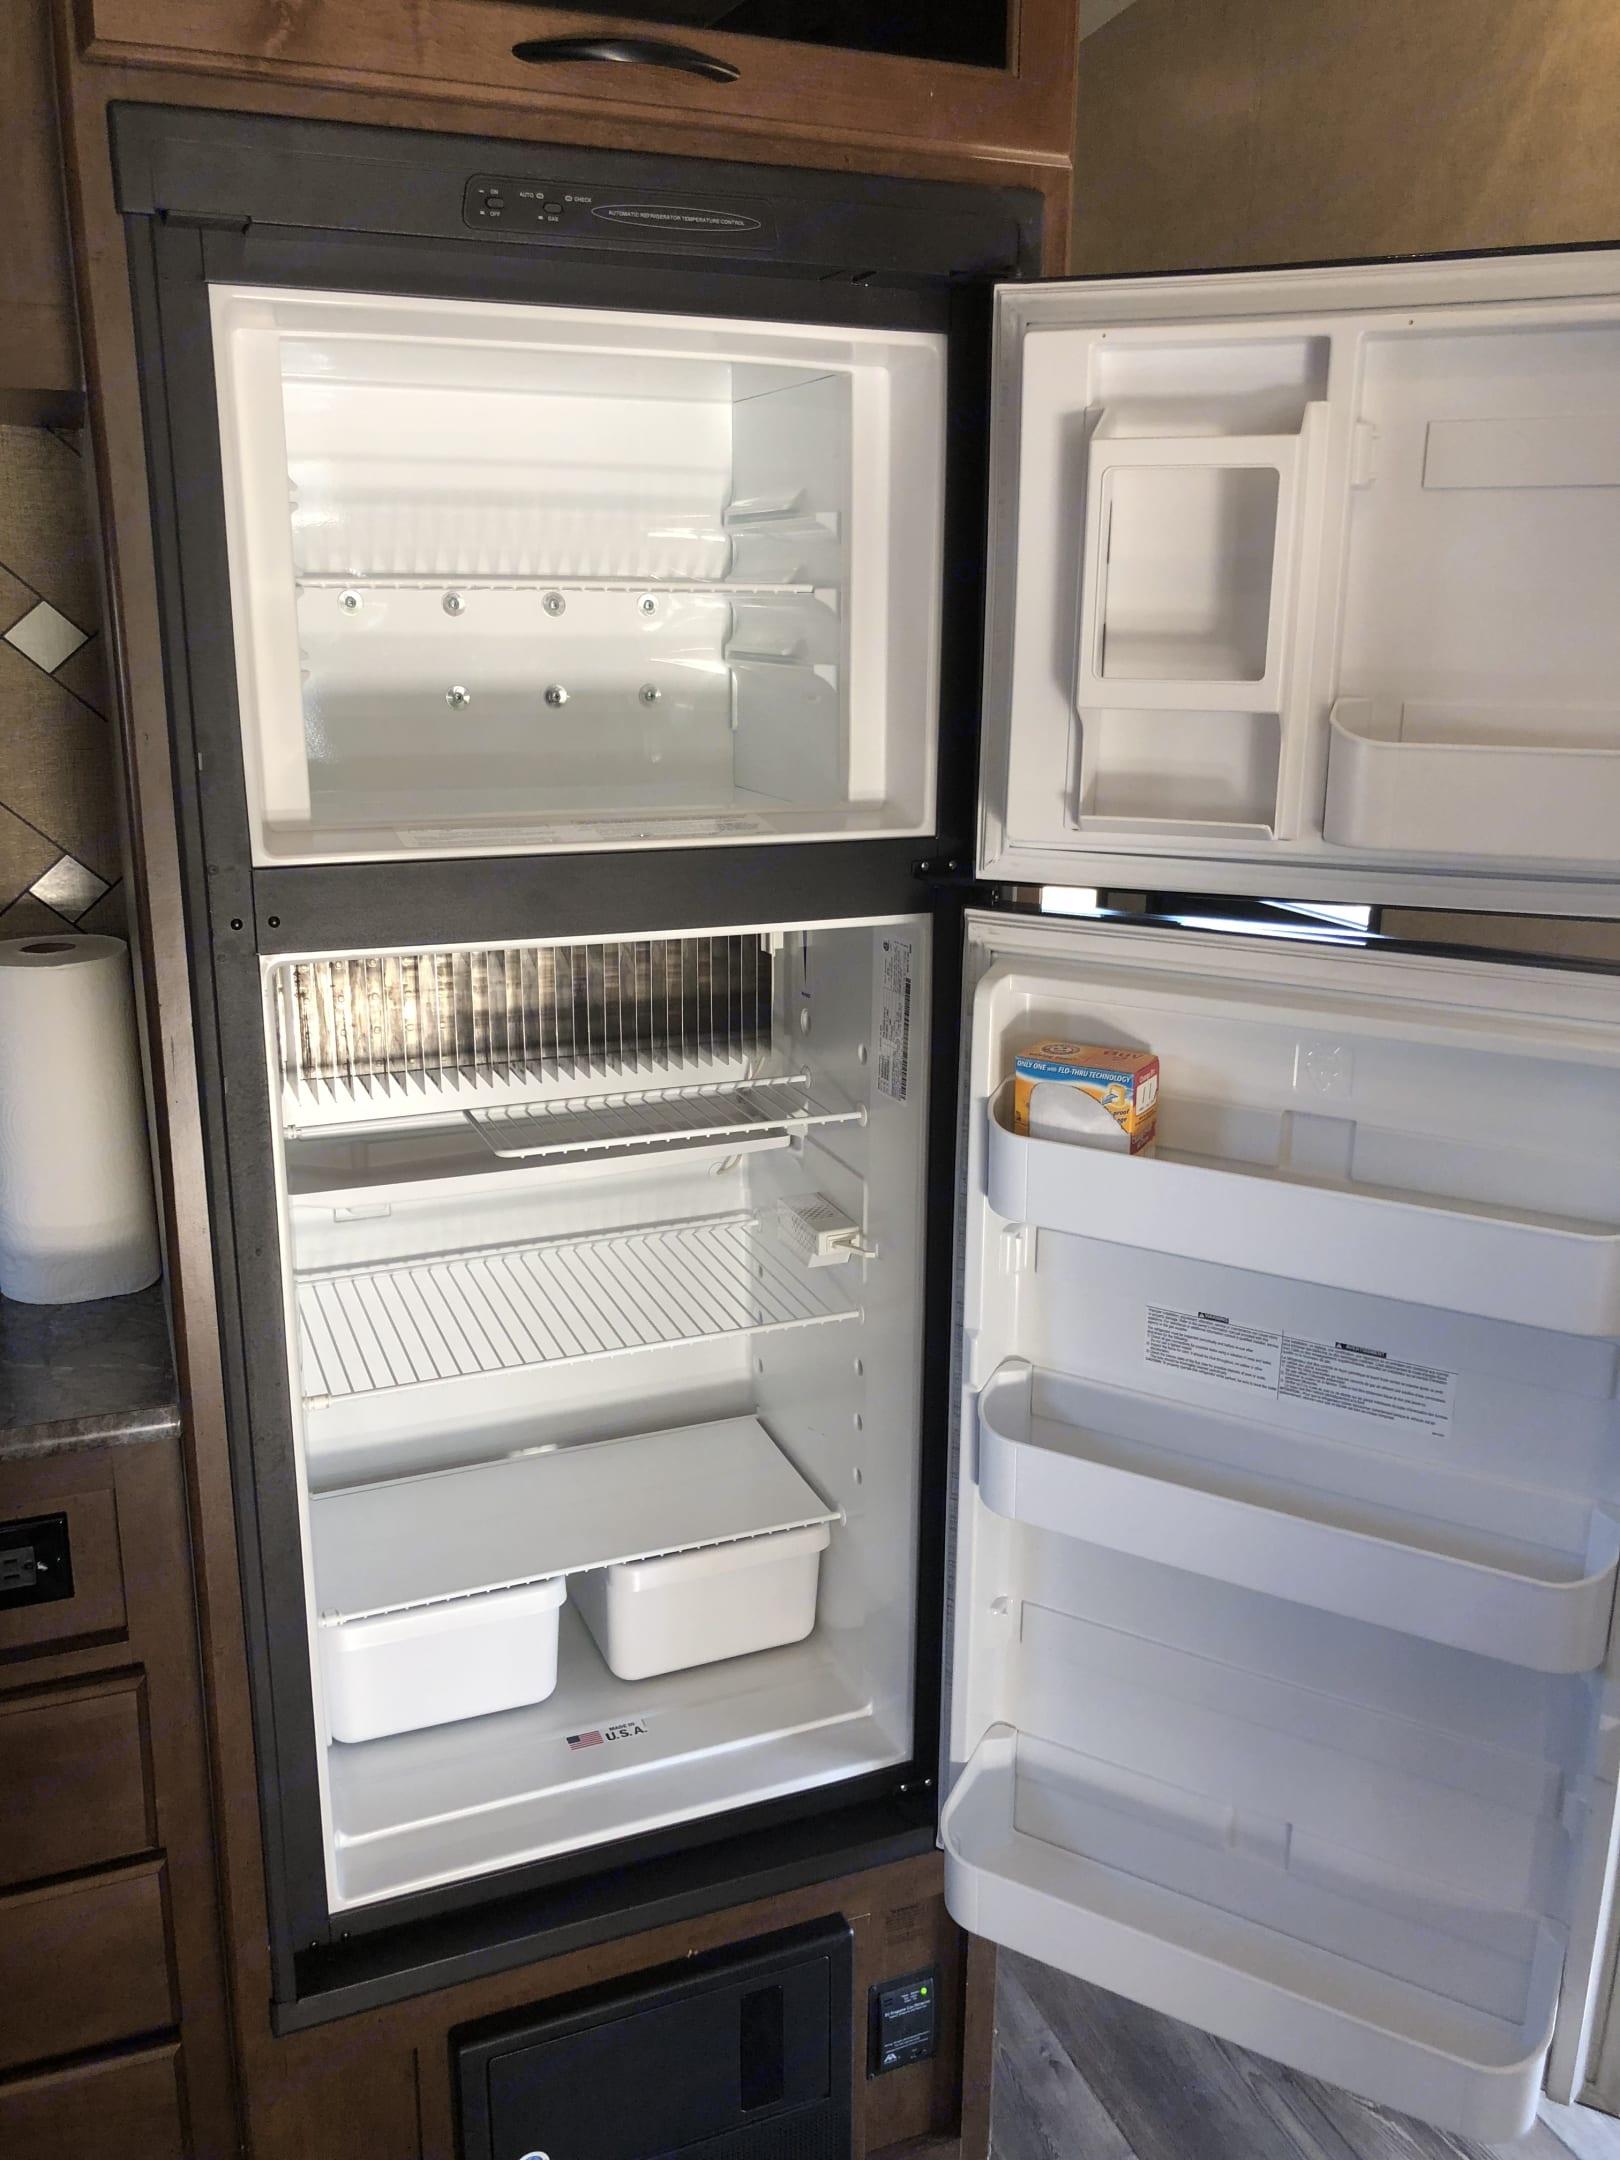 Spotless and spacious freezer and refrigerator.. Pacific Coachworks Sandsport 2016